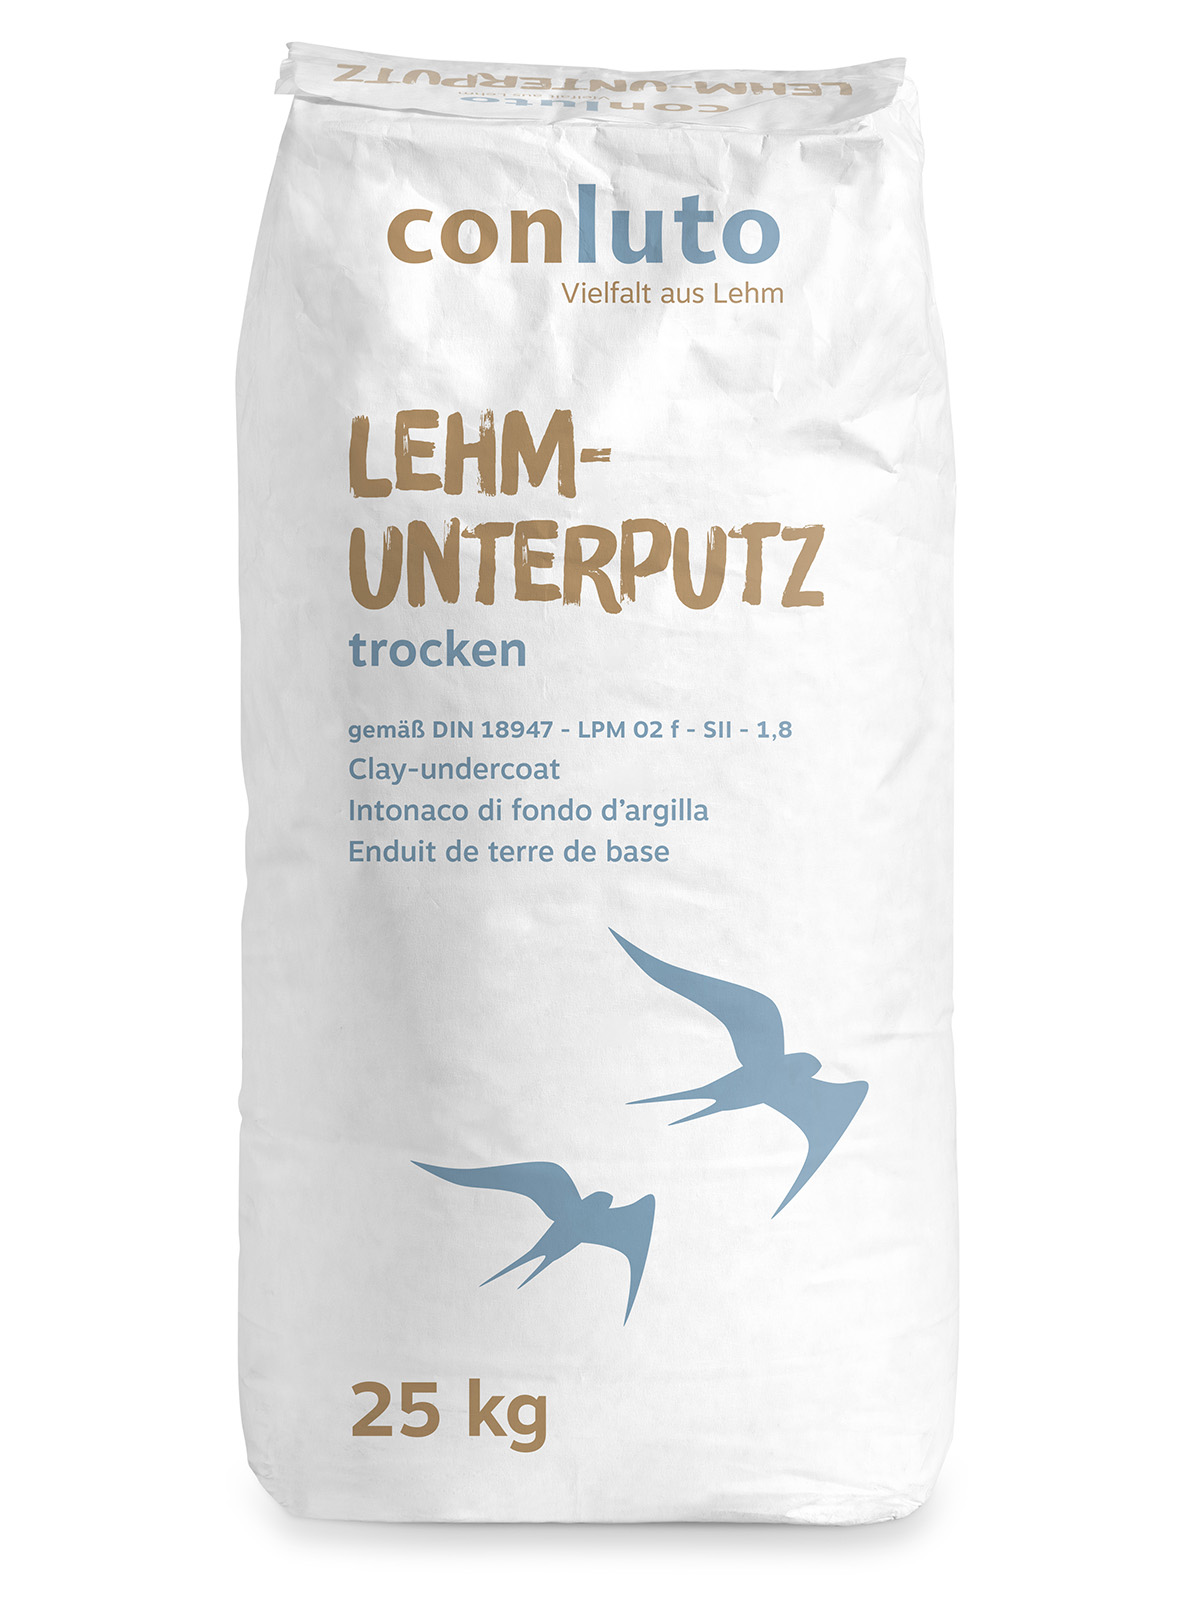 conluto Lehm-Unterputz trocken